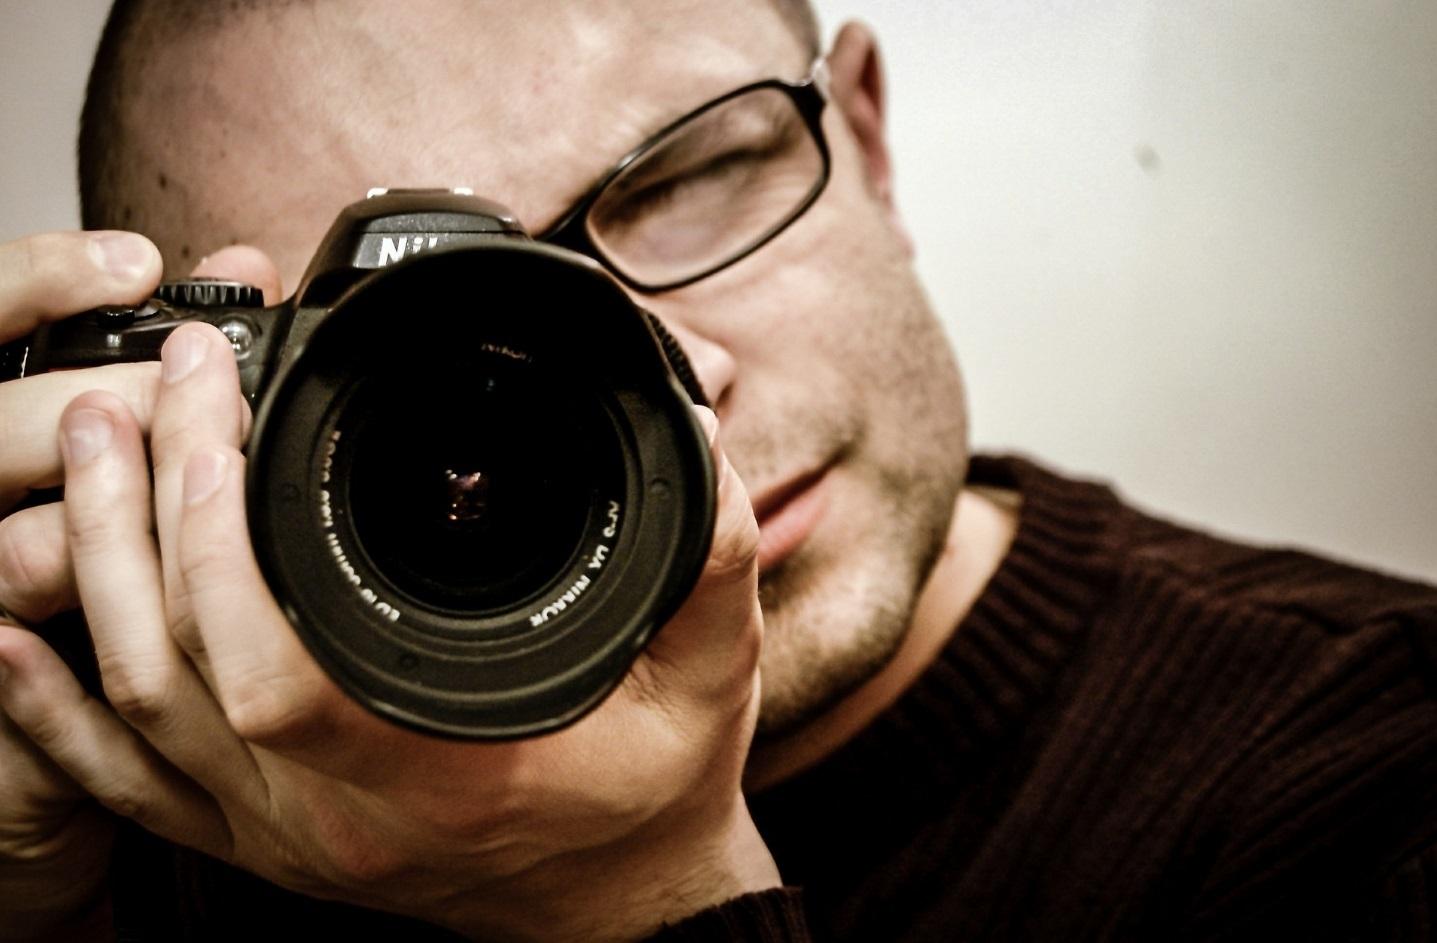 Fotograf mit Kamera. [Copyright = jarmoluk / pixabay.com]